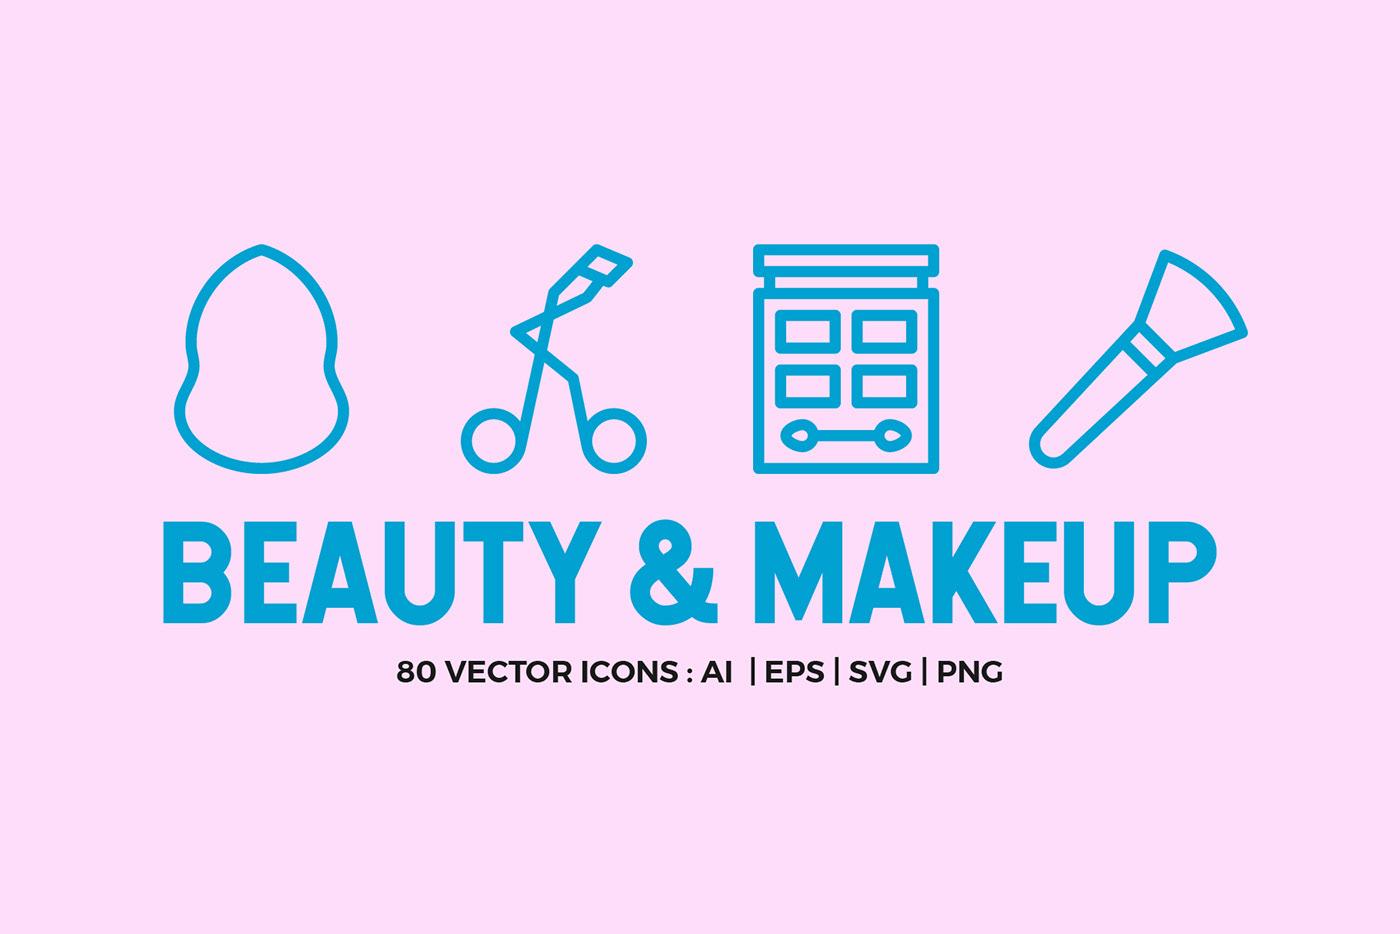 Beauty & Makeup Line Icons